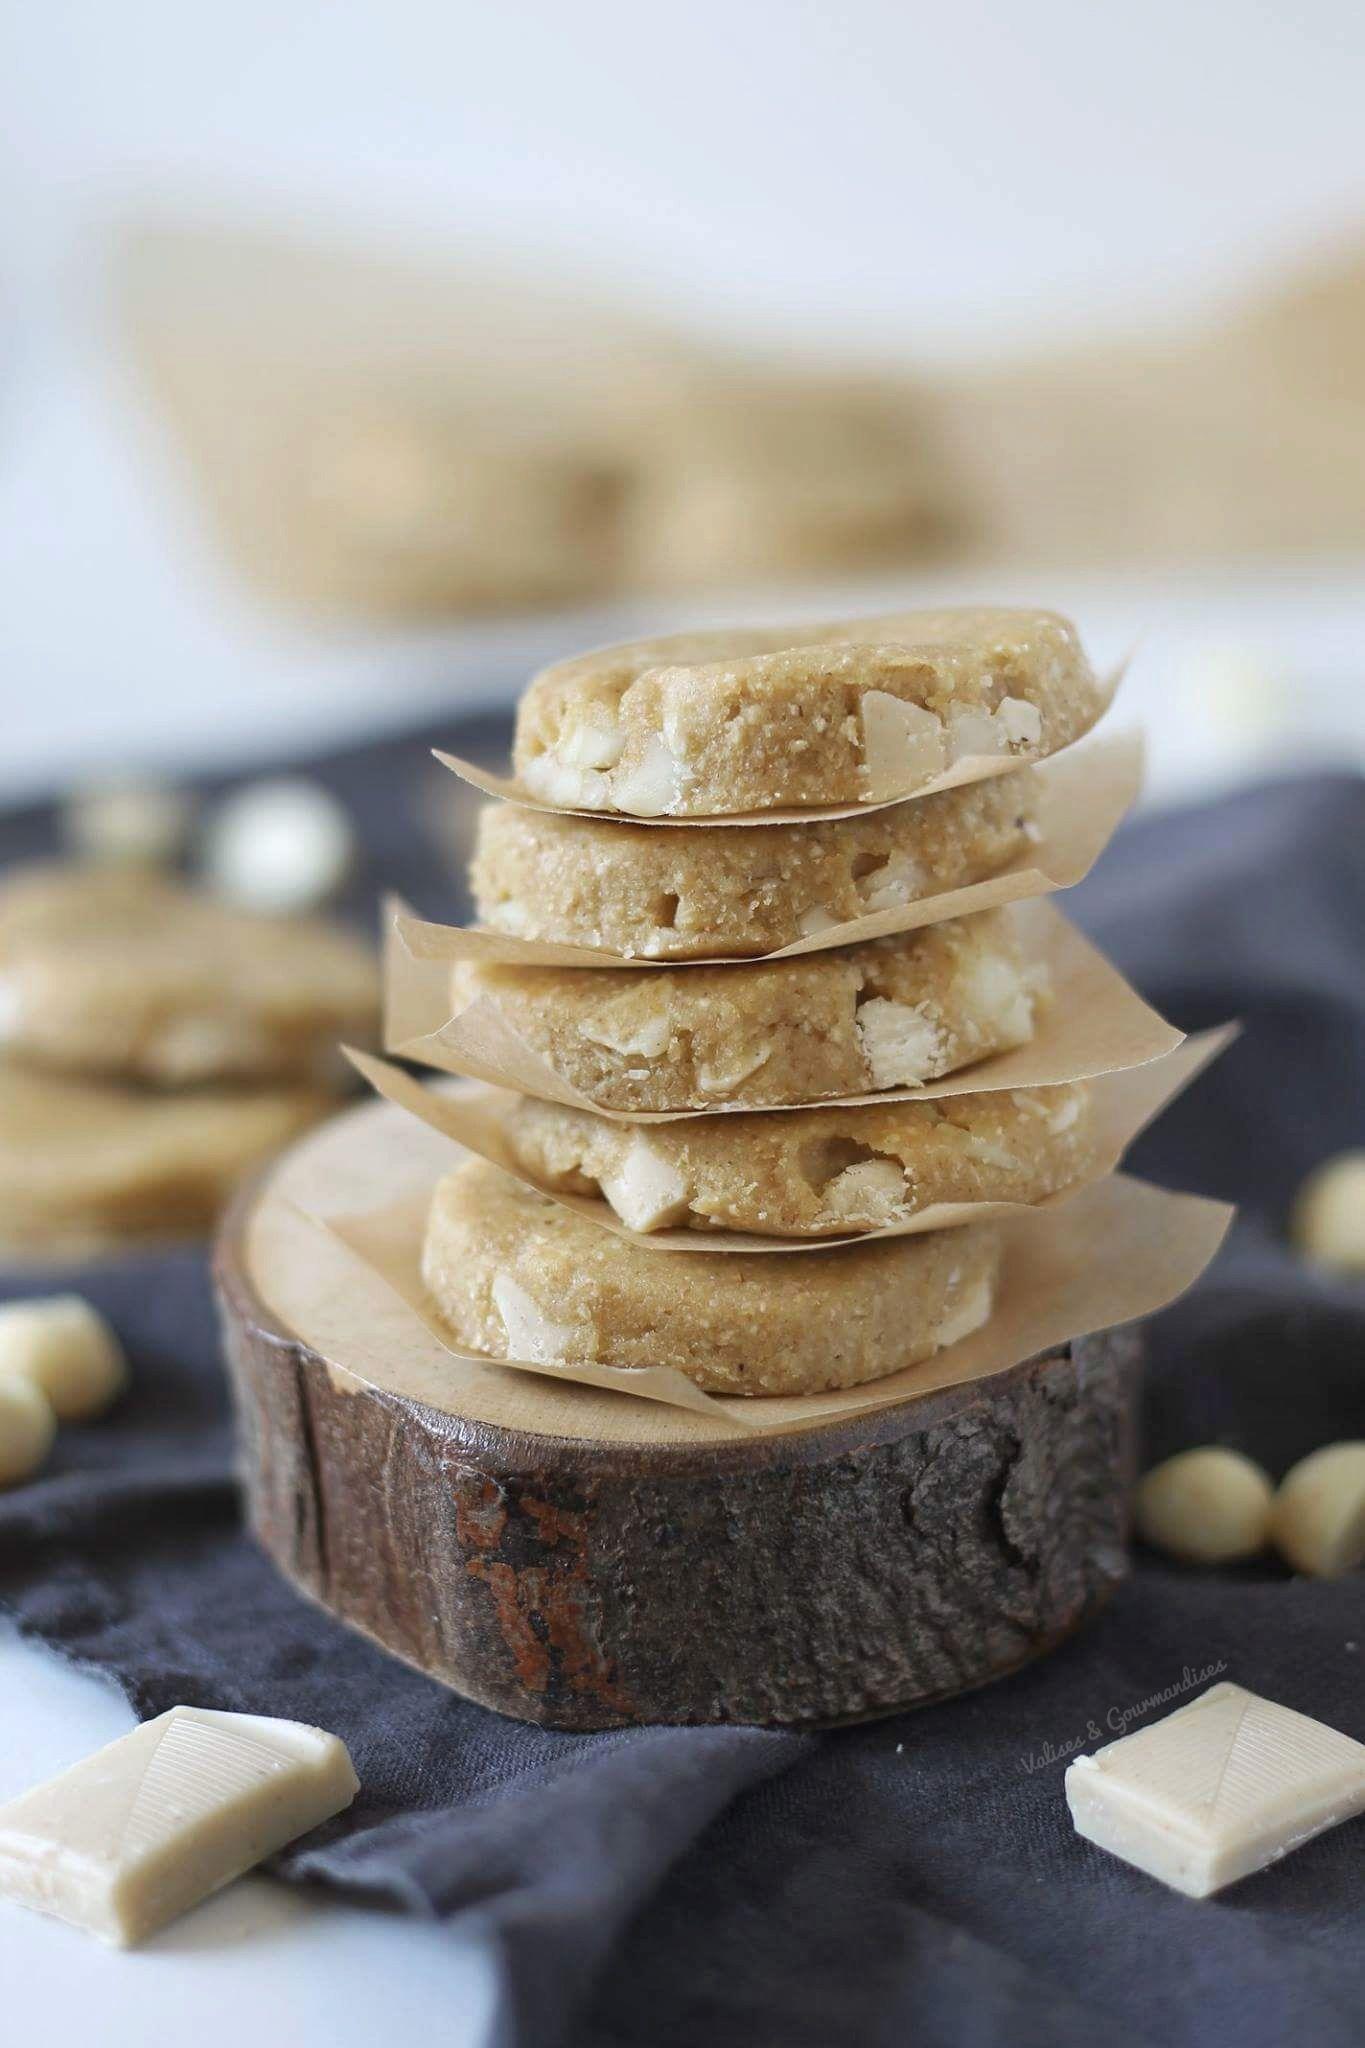 No Bake Vegan White Chocolate And Macadamia Cookies Valises Gourmandises Recipe Vegan White Chocolate Dessert Recipes Desserts